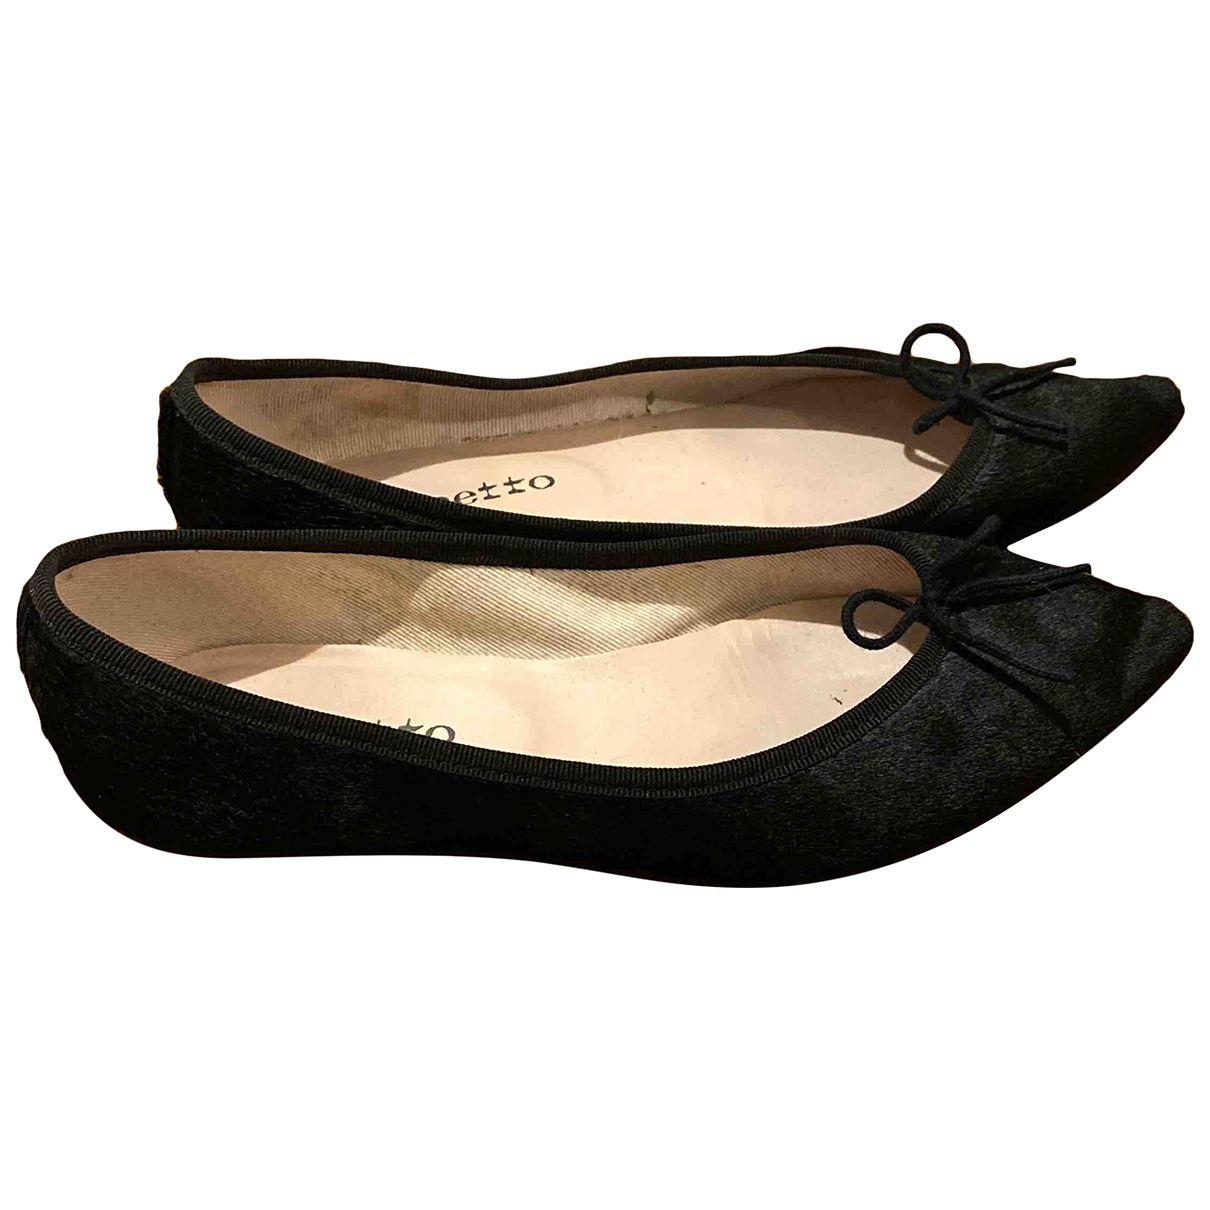 Repetto \N Black Pony-style calfskin Ballet flats for Women 39 EU